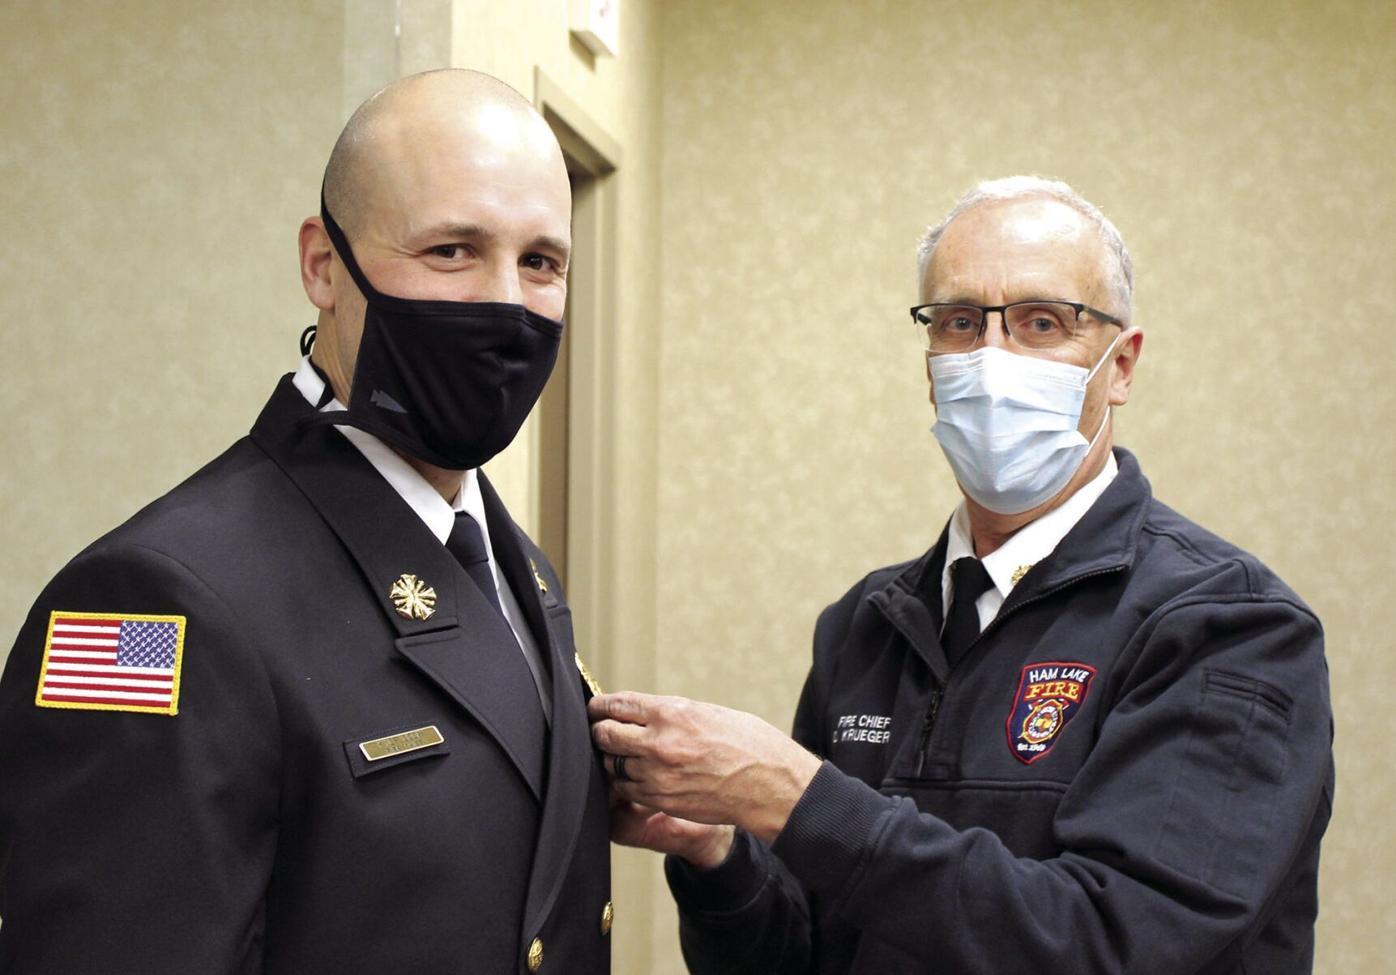 HL fire chief-2_CMYK.jpg